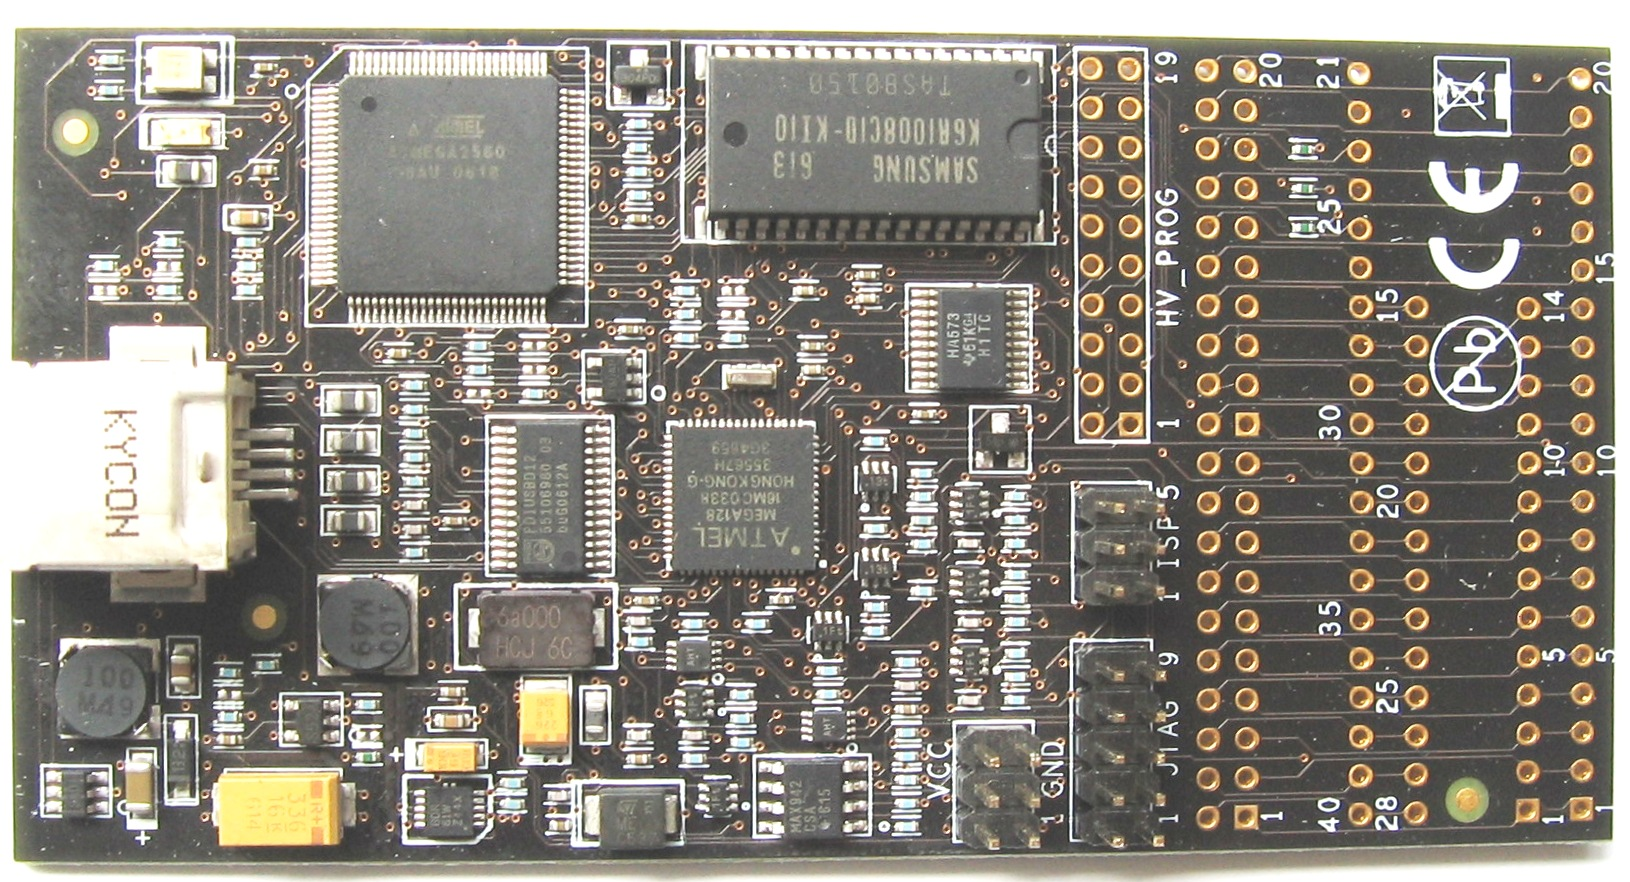 Avr Dragon Isp And Emulator For Microcontrollers Mrp01 Usb Programmer